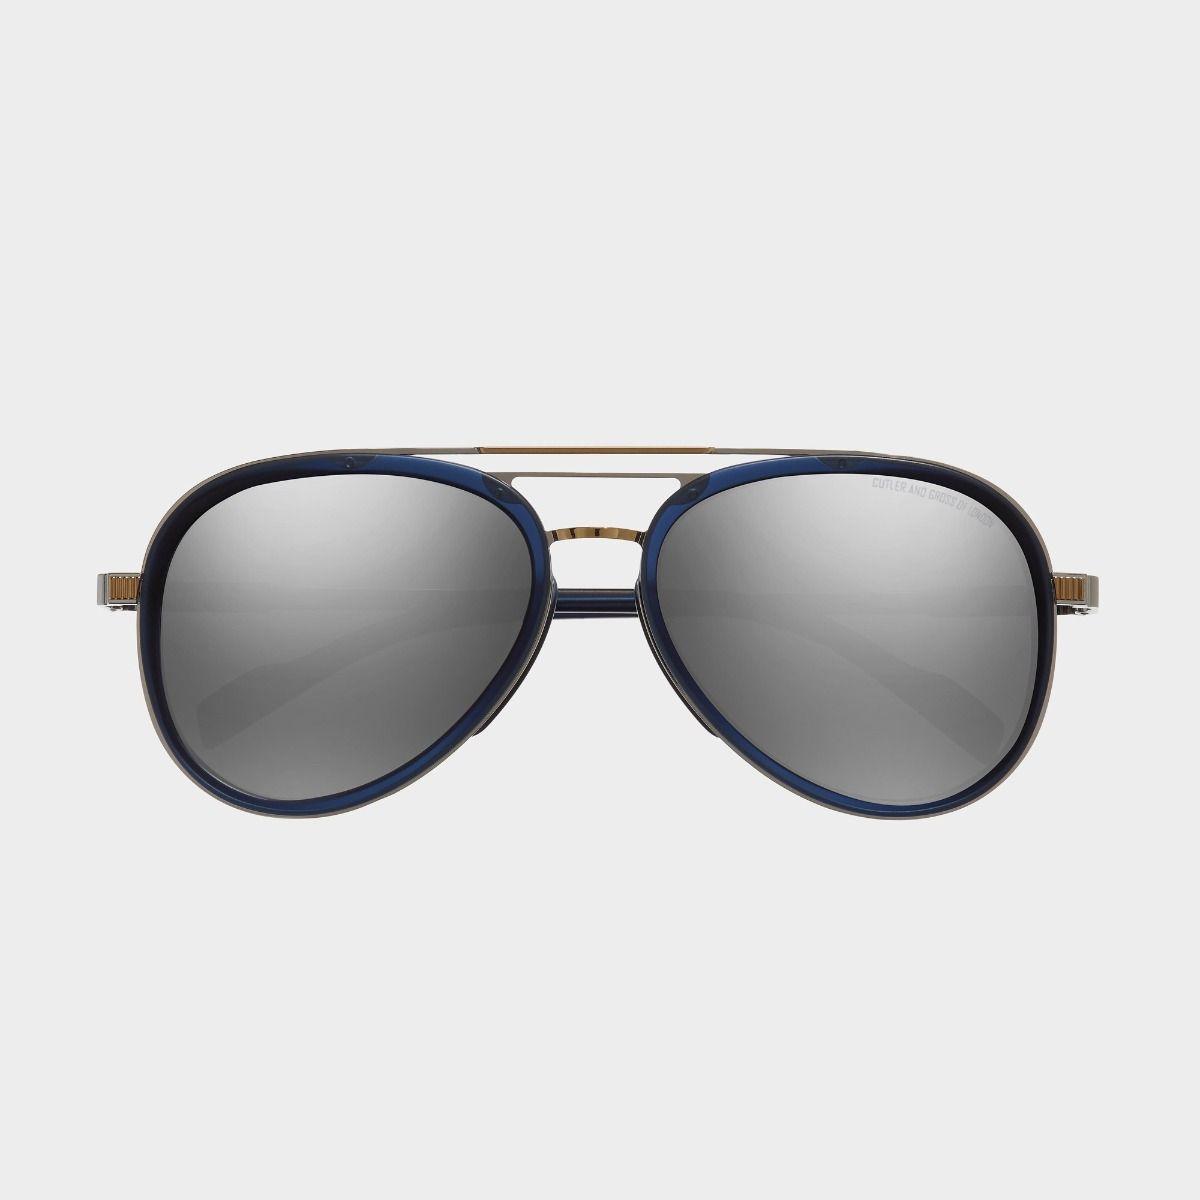 1323 Aviator Sunglasses-Classic Navy Blue